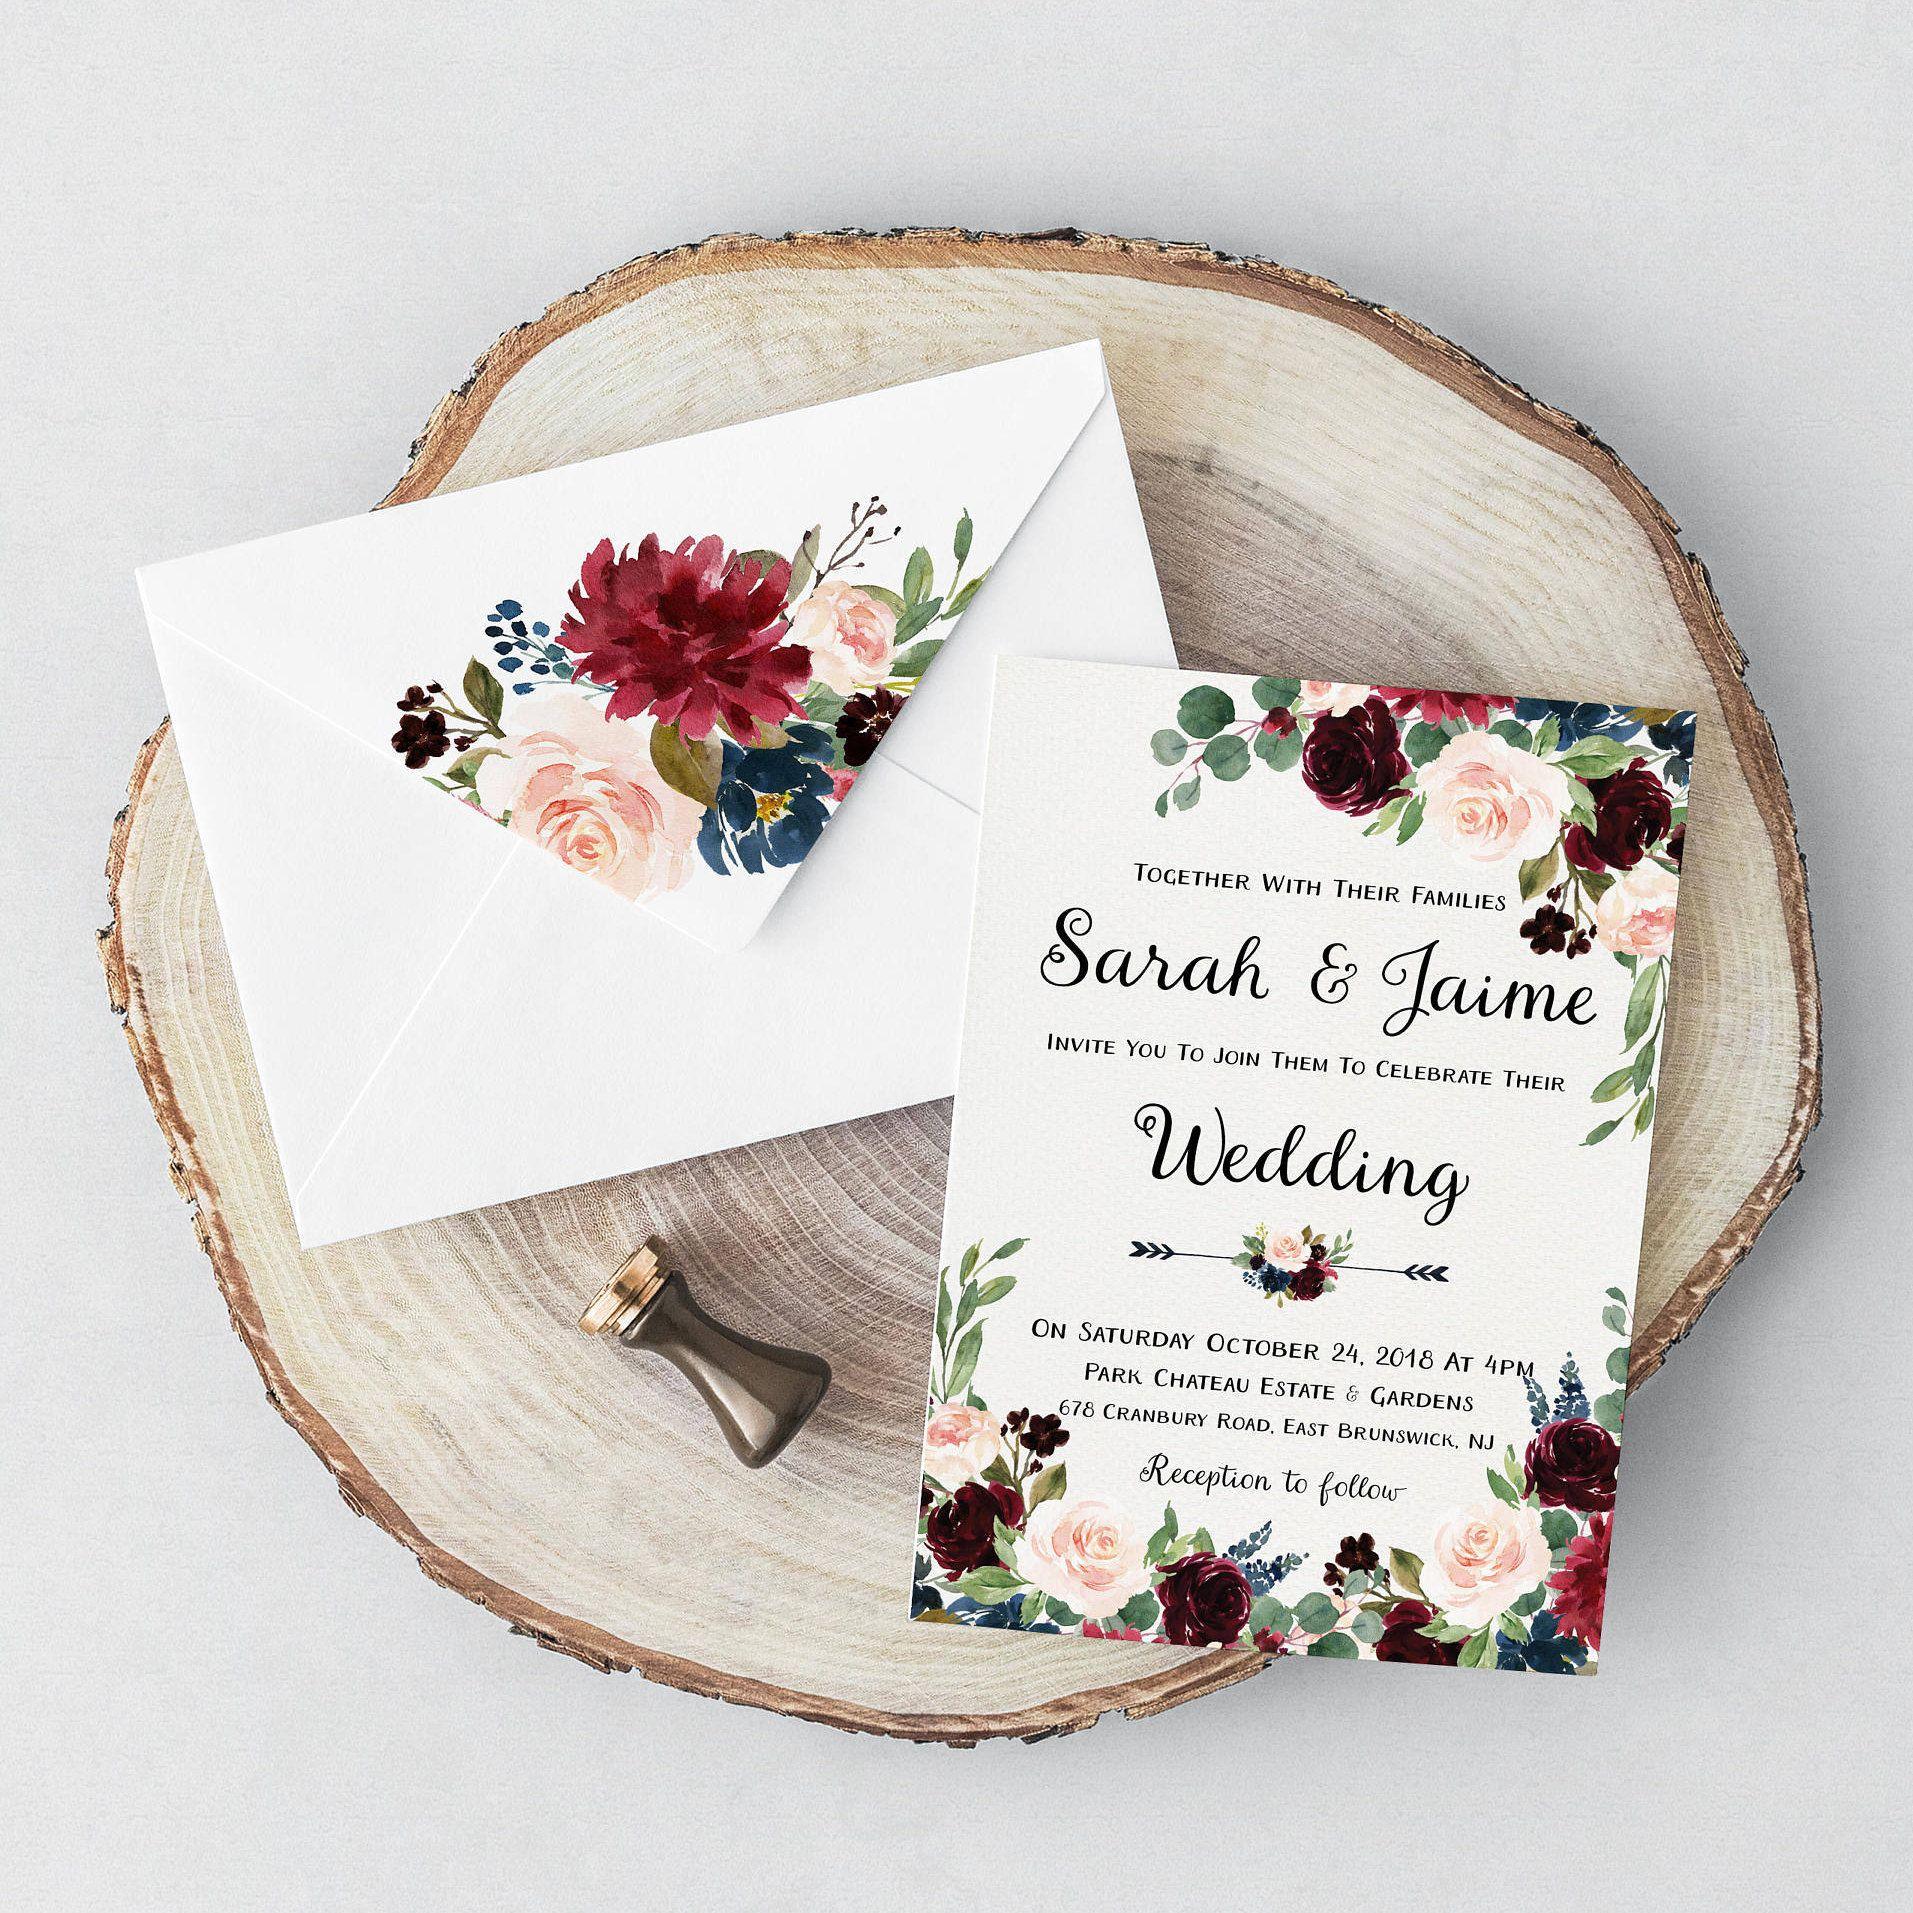 Burgundy and Navy wedding invitations - Printable Wedding invites ...